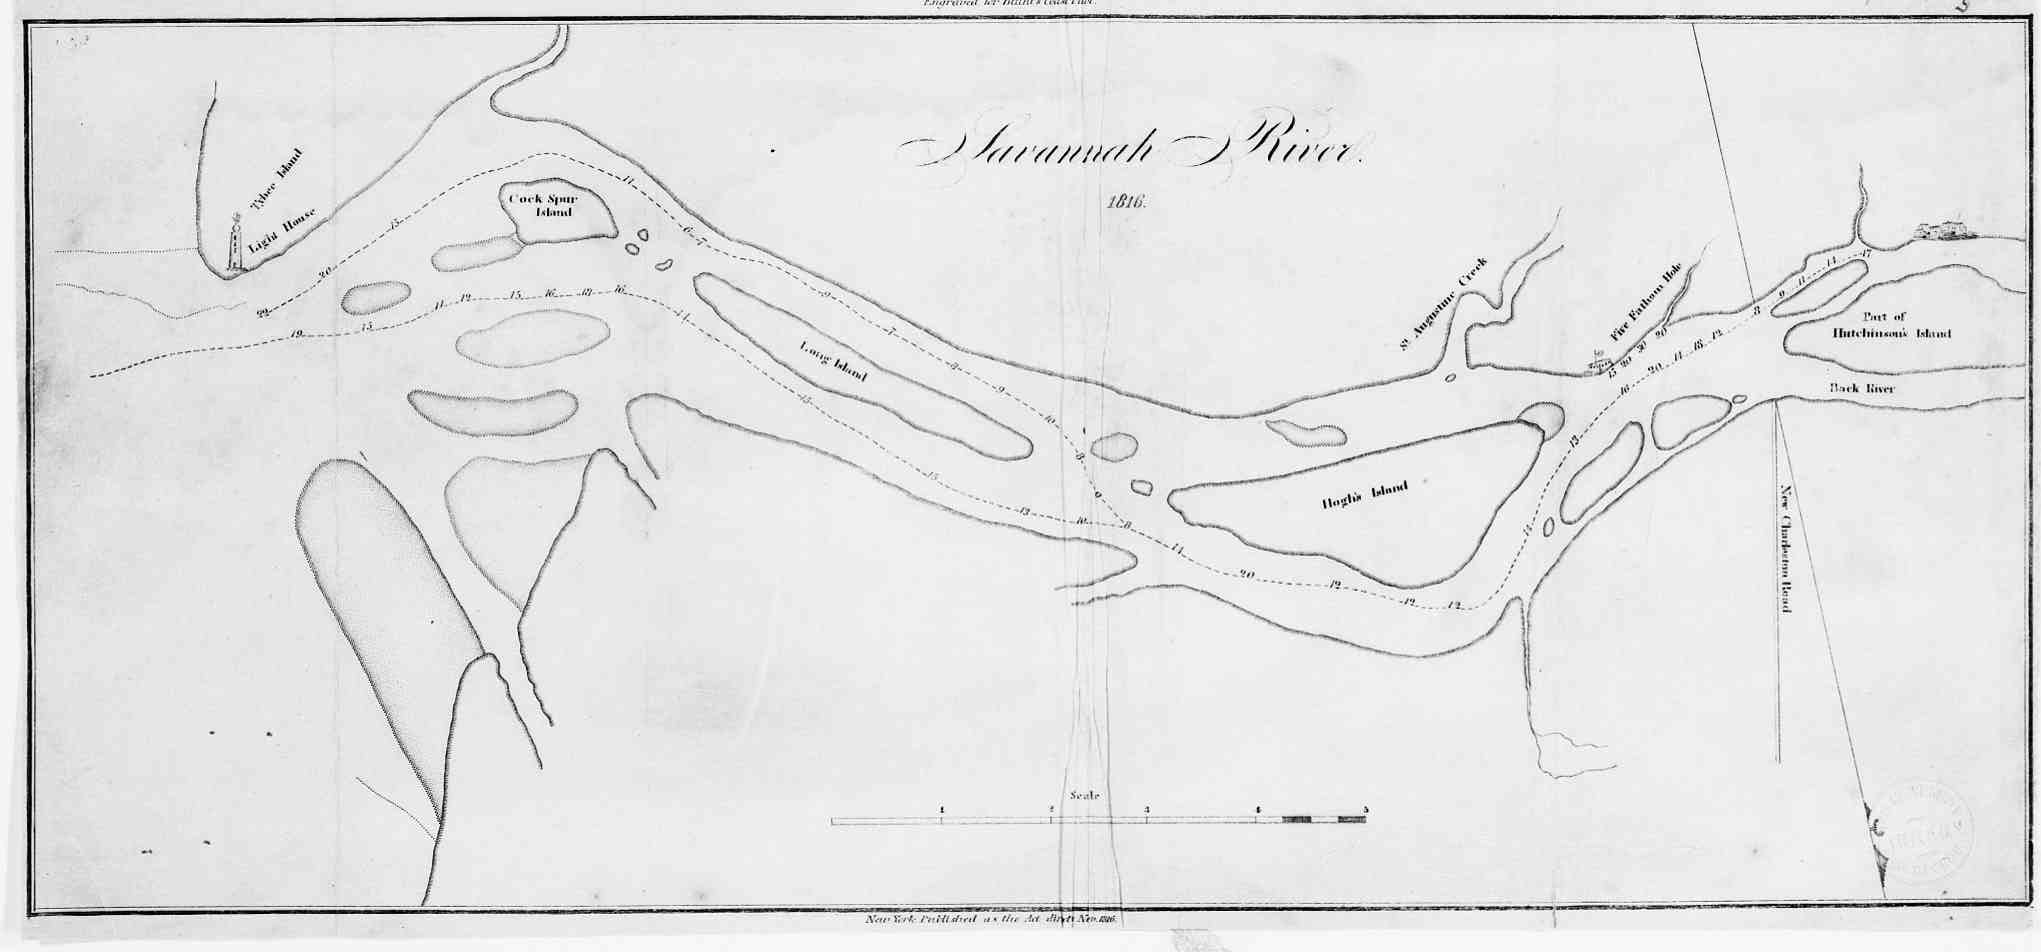 Hargrett Library Rare Map Collection Savannah The Coast - Savannah river us map